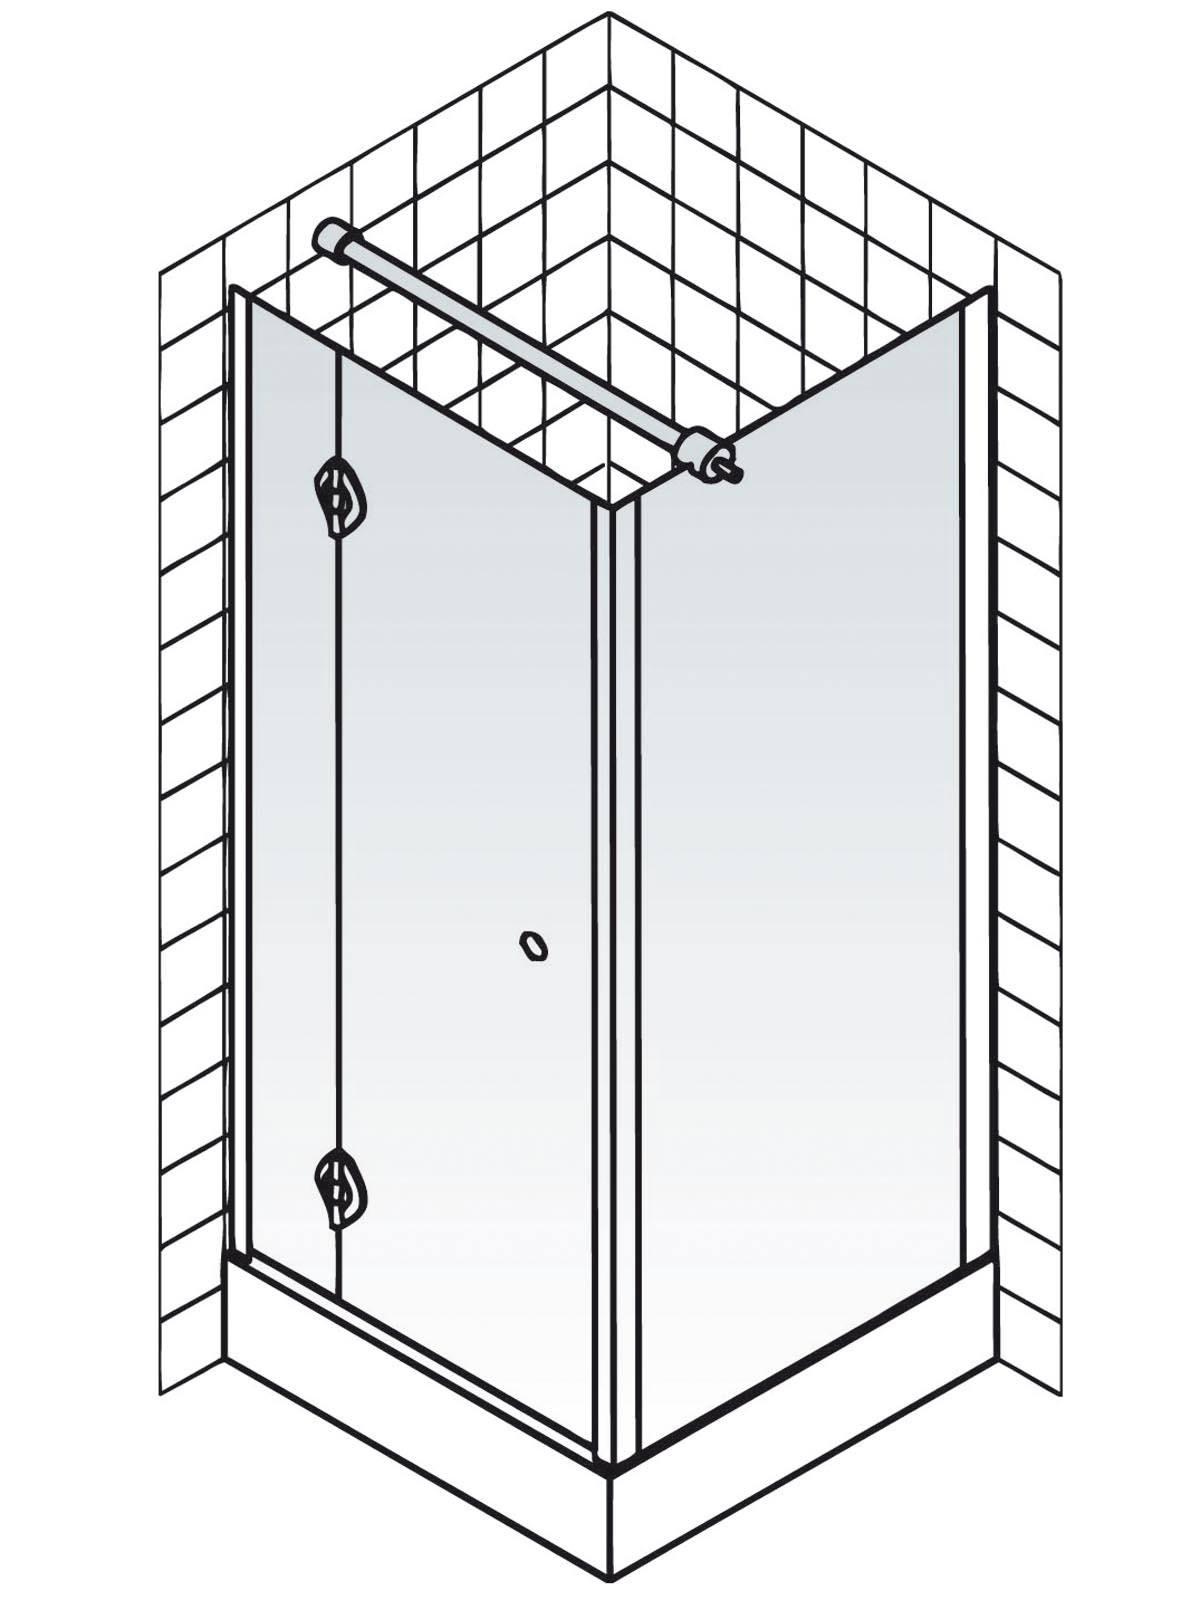 schulte service duschkabinen montage pro ecke. Black Bedroom Furniture Sets. Home Design Ideas